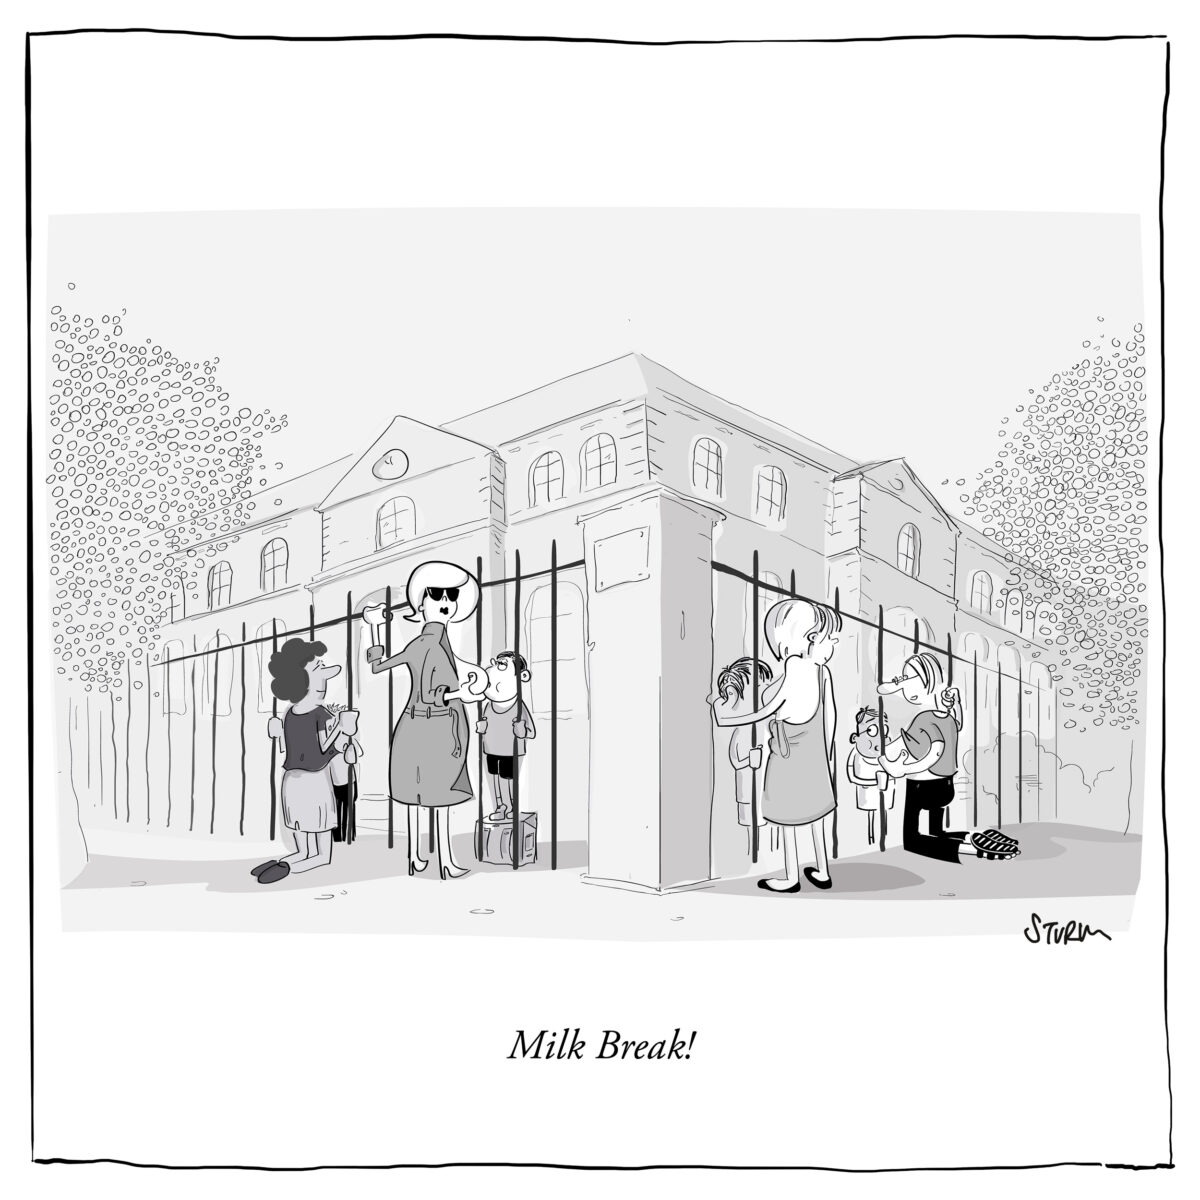 Milk Break - Cartoon by Philipp Sturm